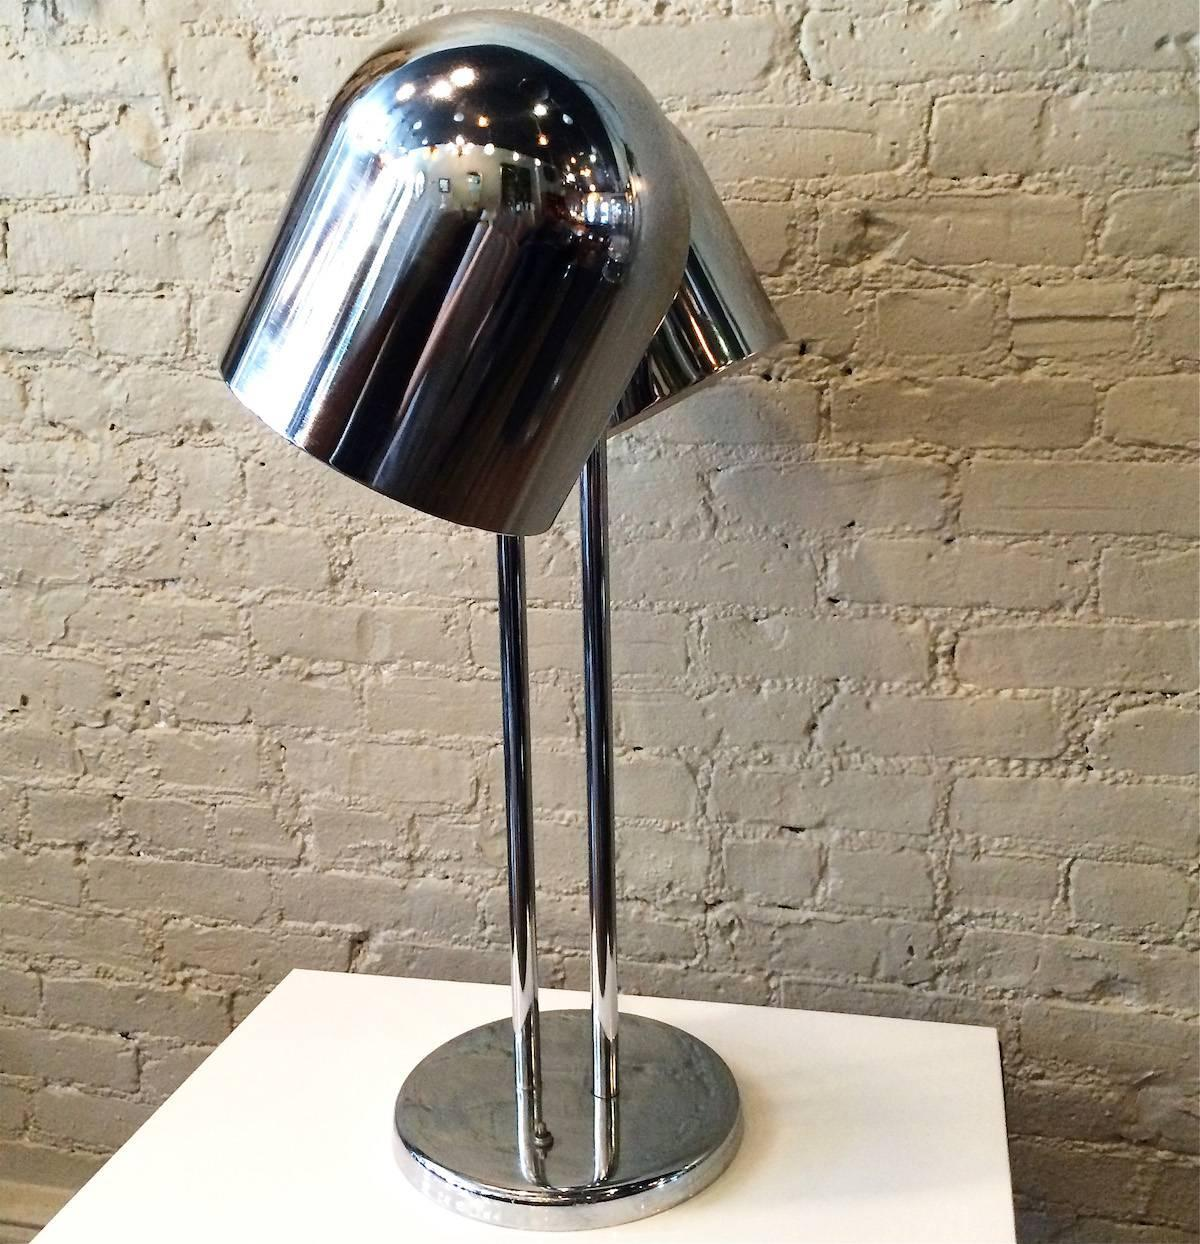 Mid Century Modern Double Headed Chrome Desk Lamp By